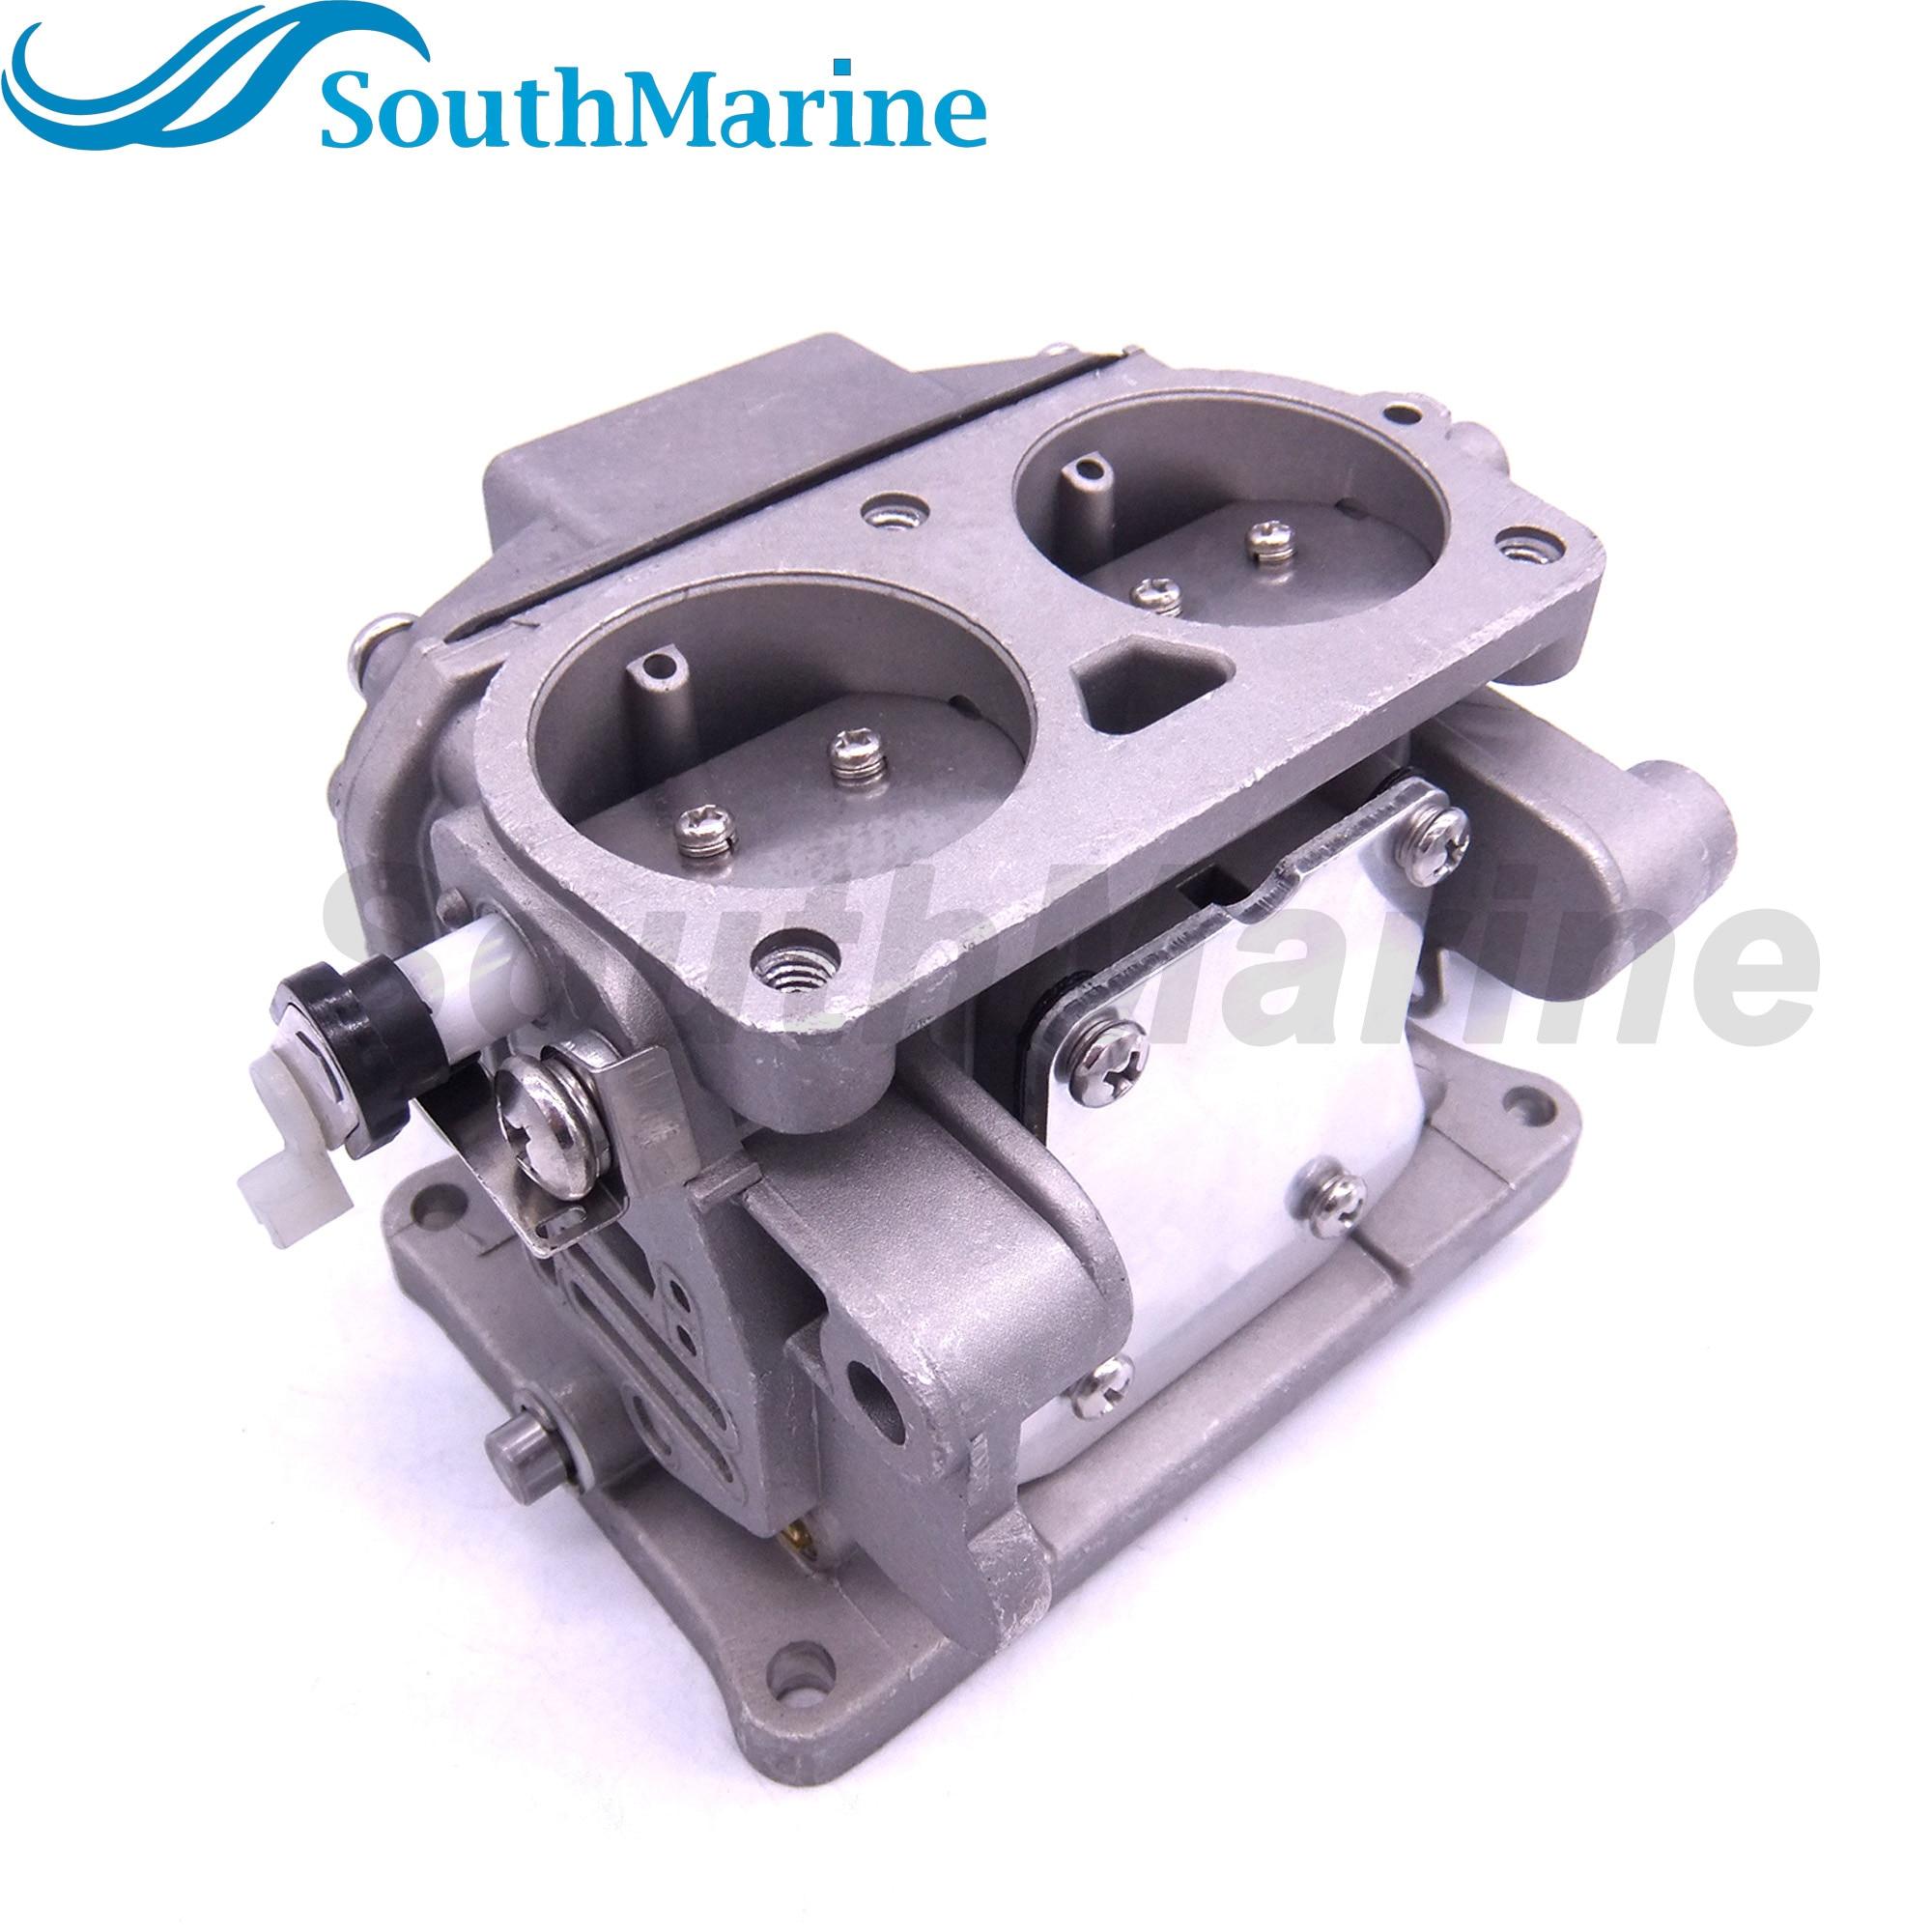 Boat Motor 6F6-14301-00 01 02 03 04 05 06 Carburetor Carb Assy For Yamaha Outboard Engine E40G E40J E40 40HP 2-Stroke